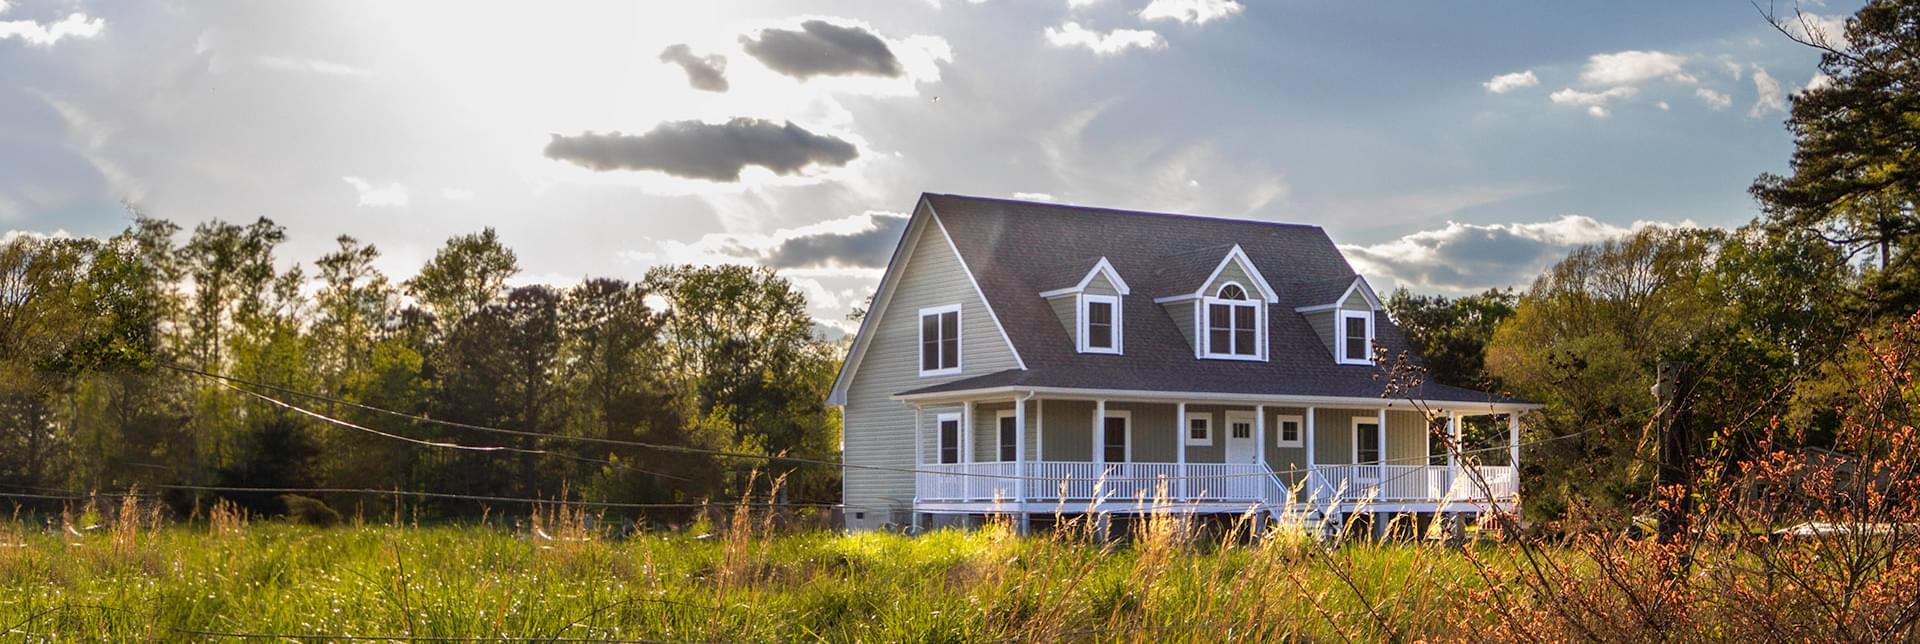 New Homes in Charles City County VA